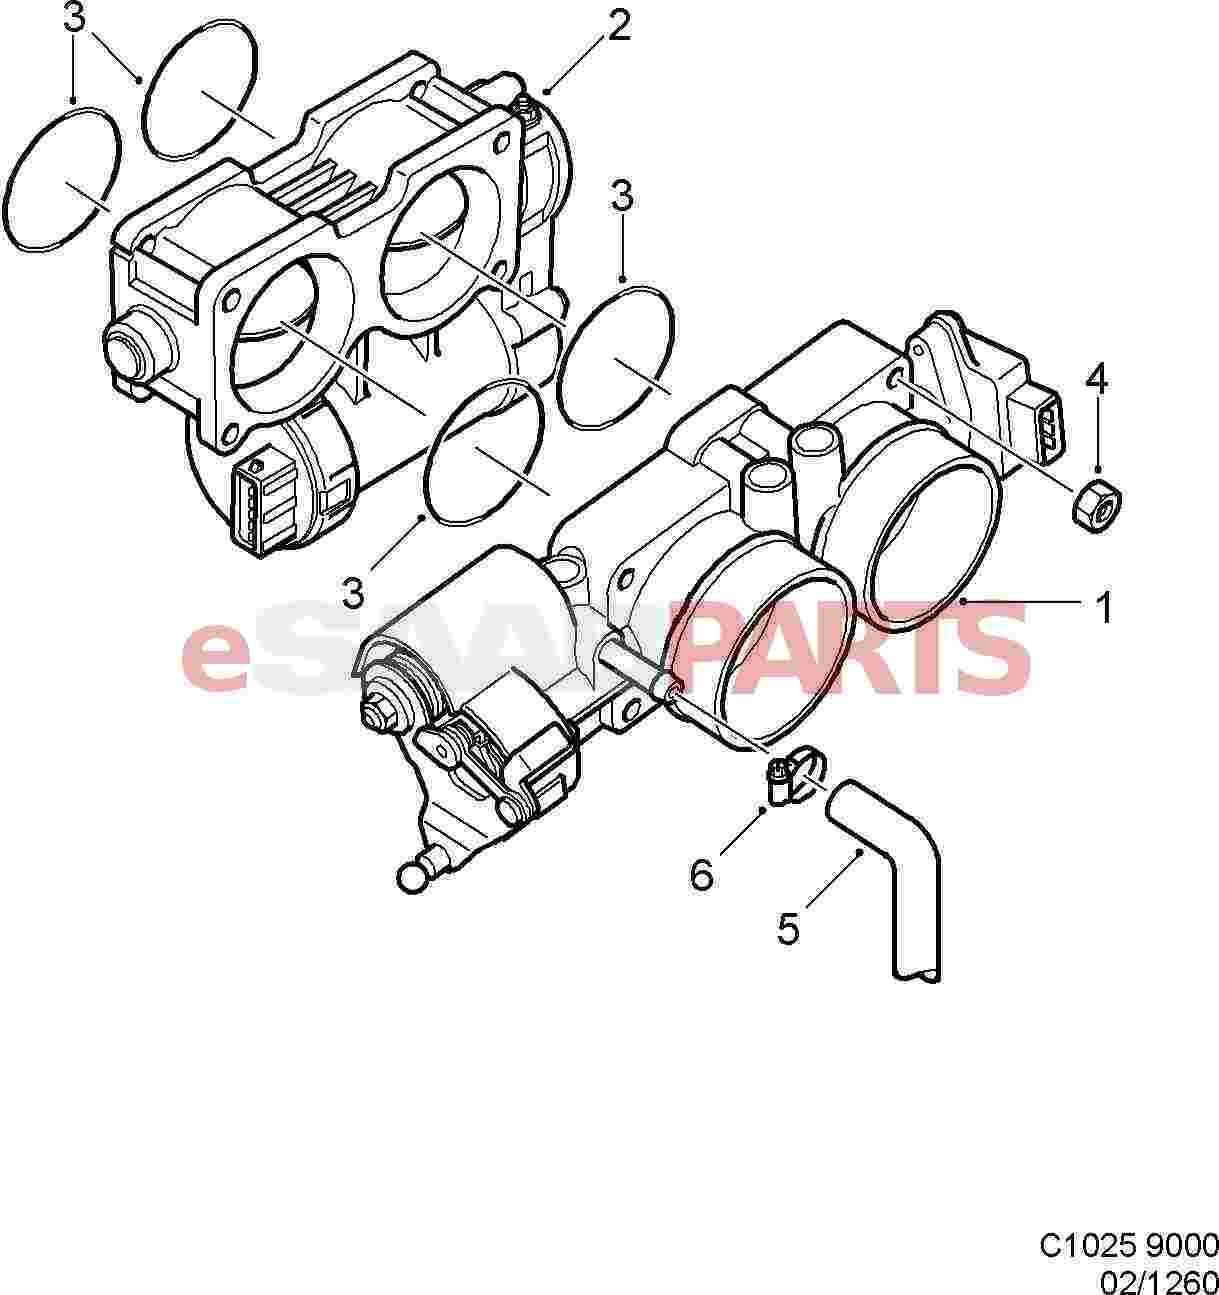 Saab Electronic Throttle Actuator